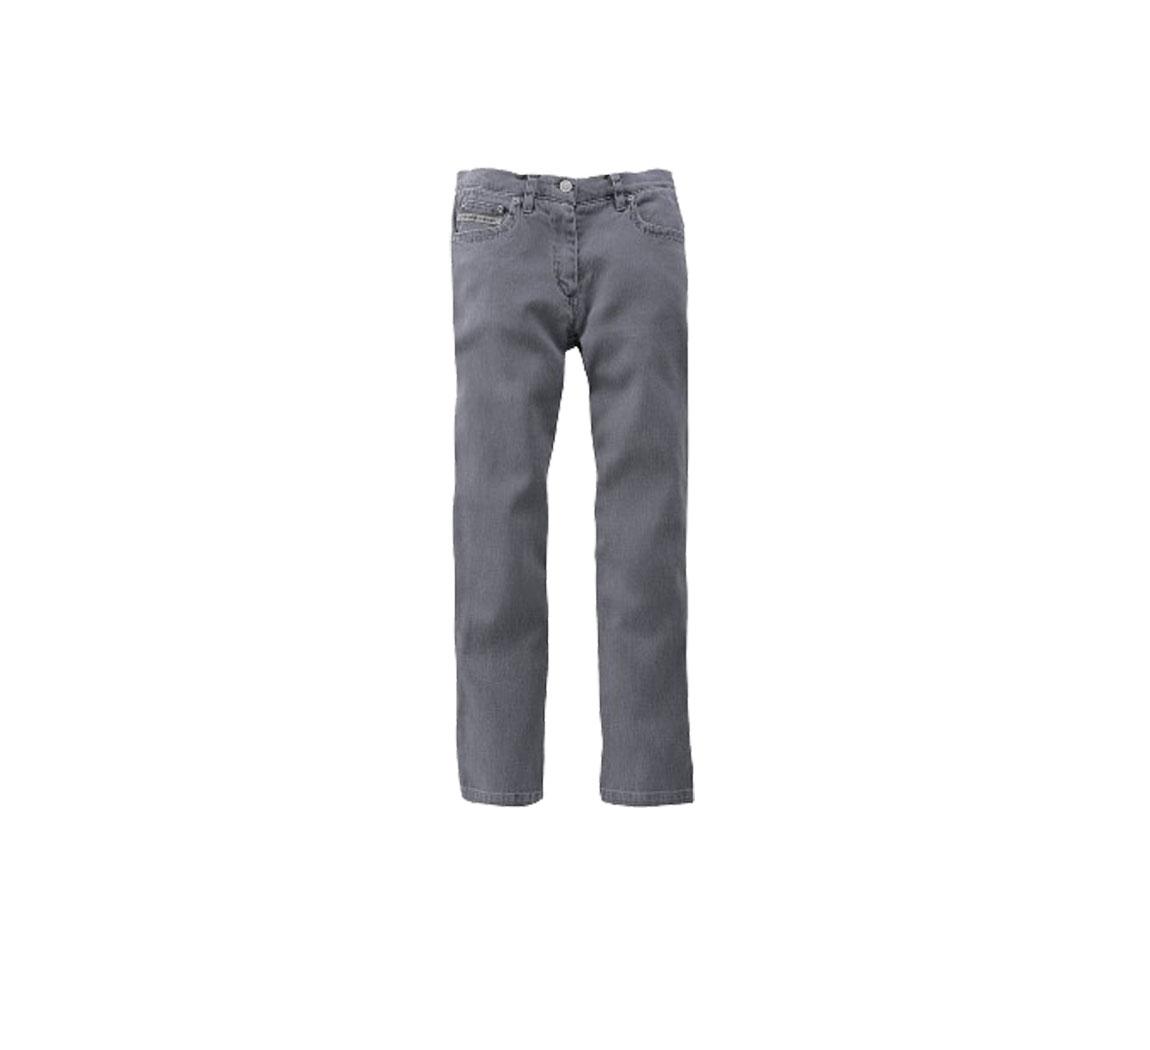 jeans femme vegan Jean Bea